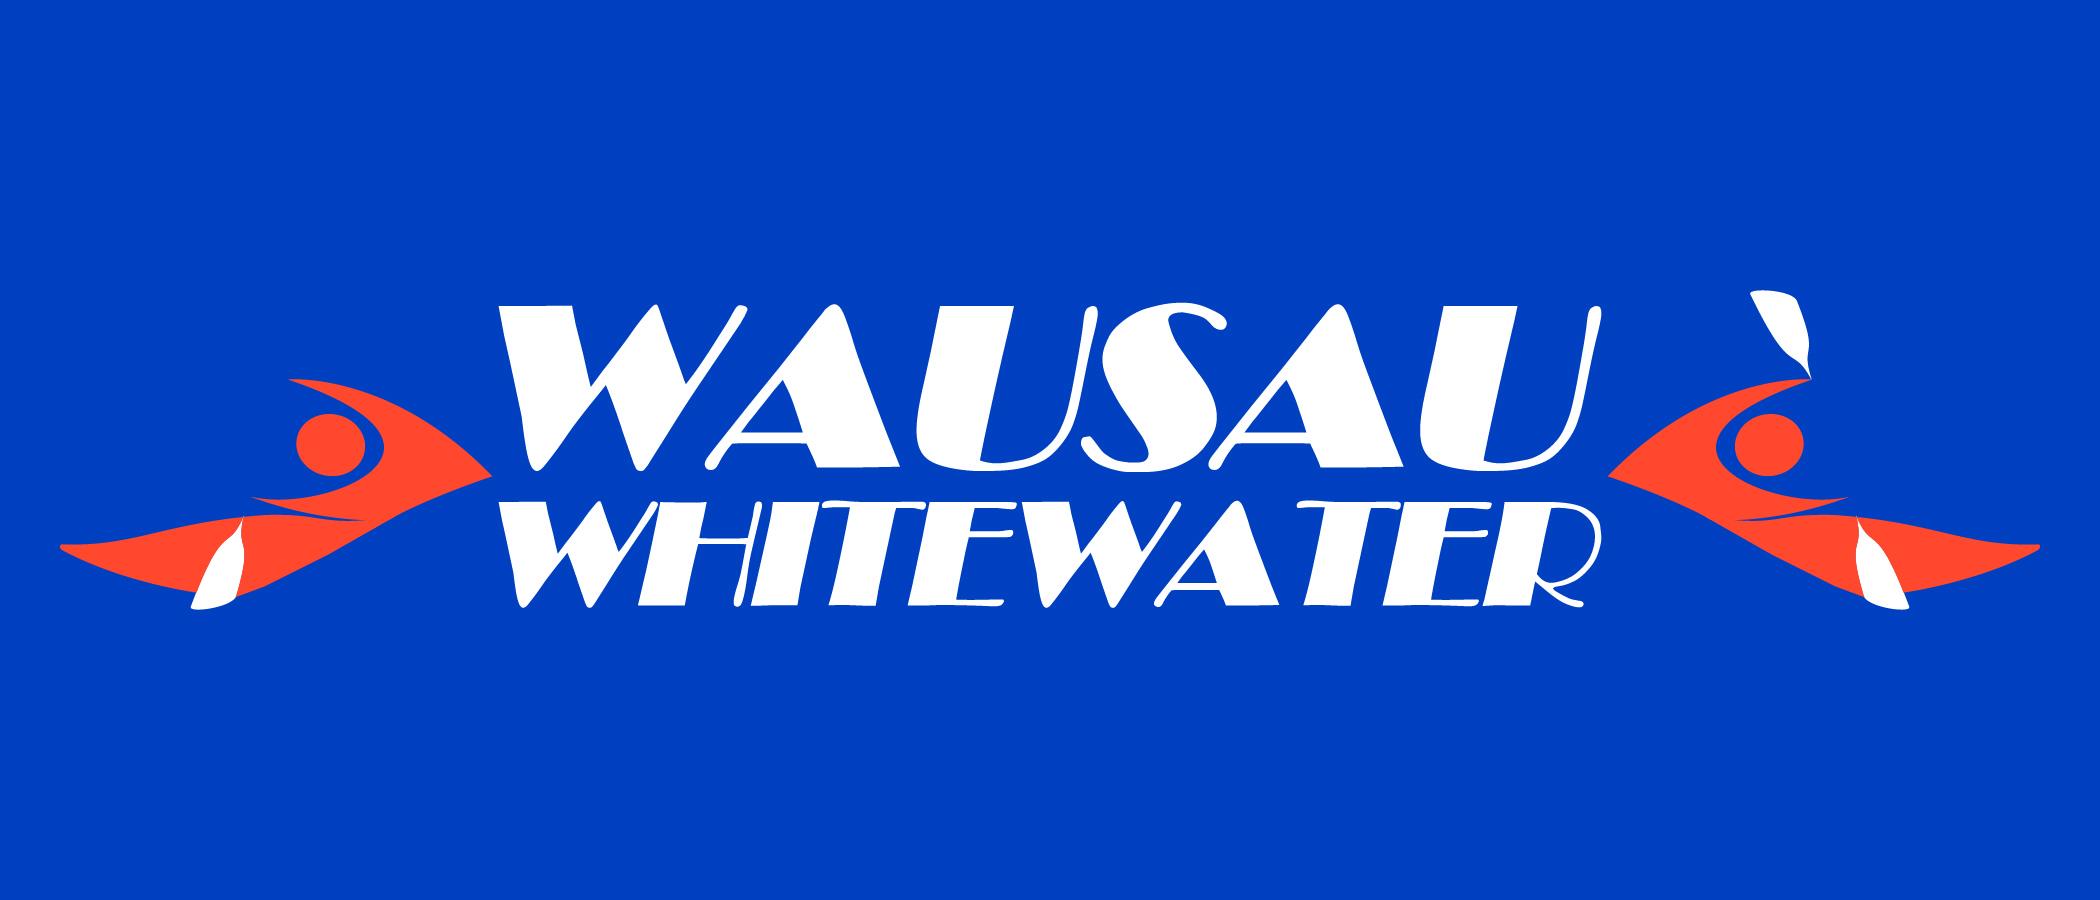 Wausau Whitewater Logo